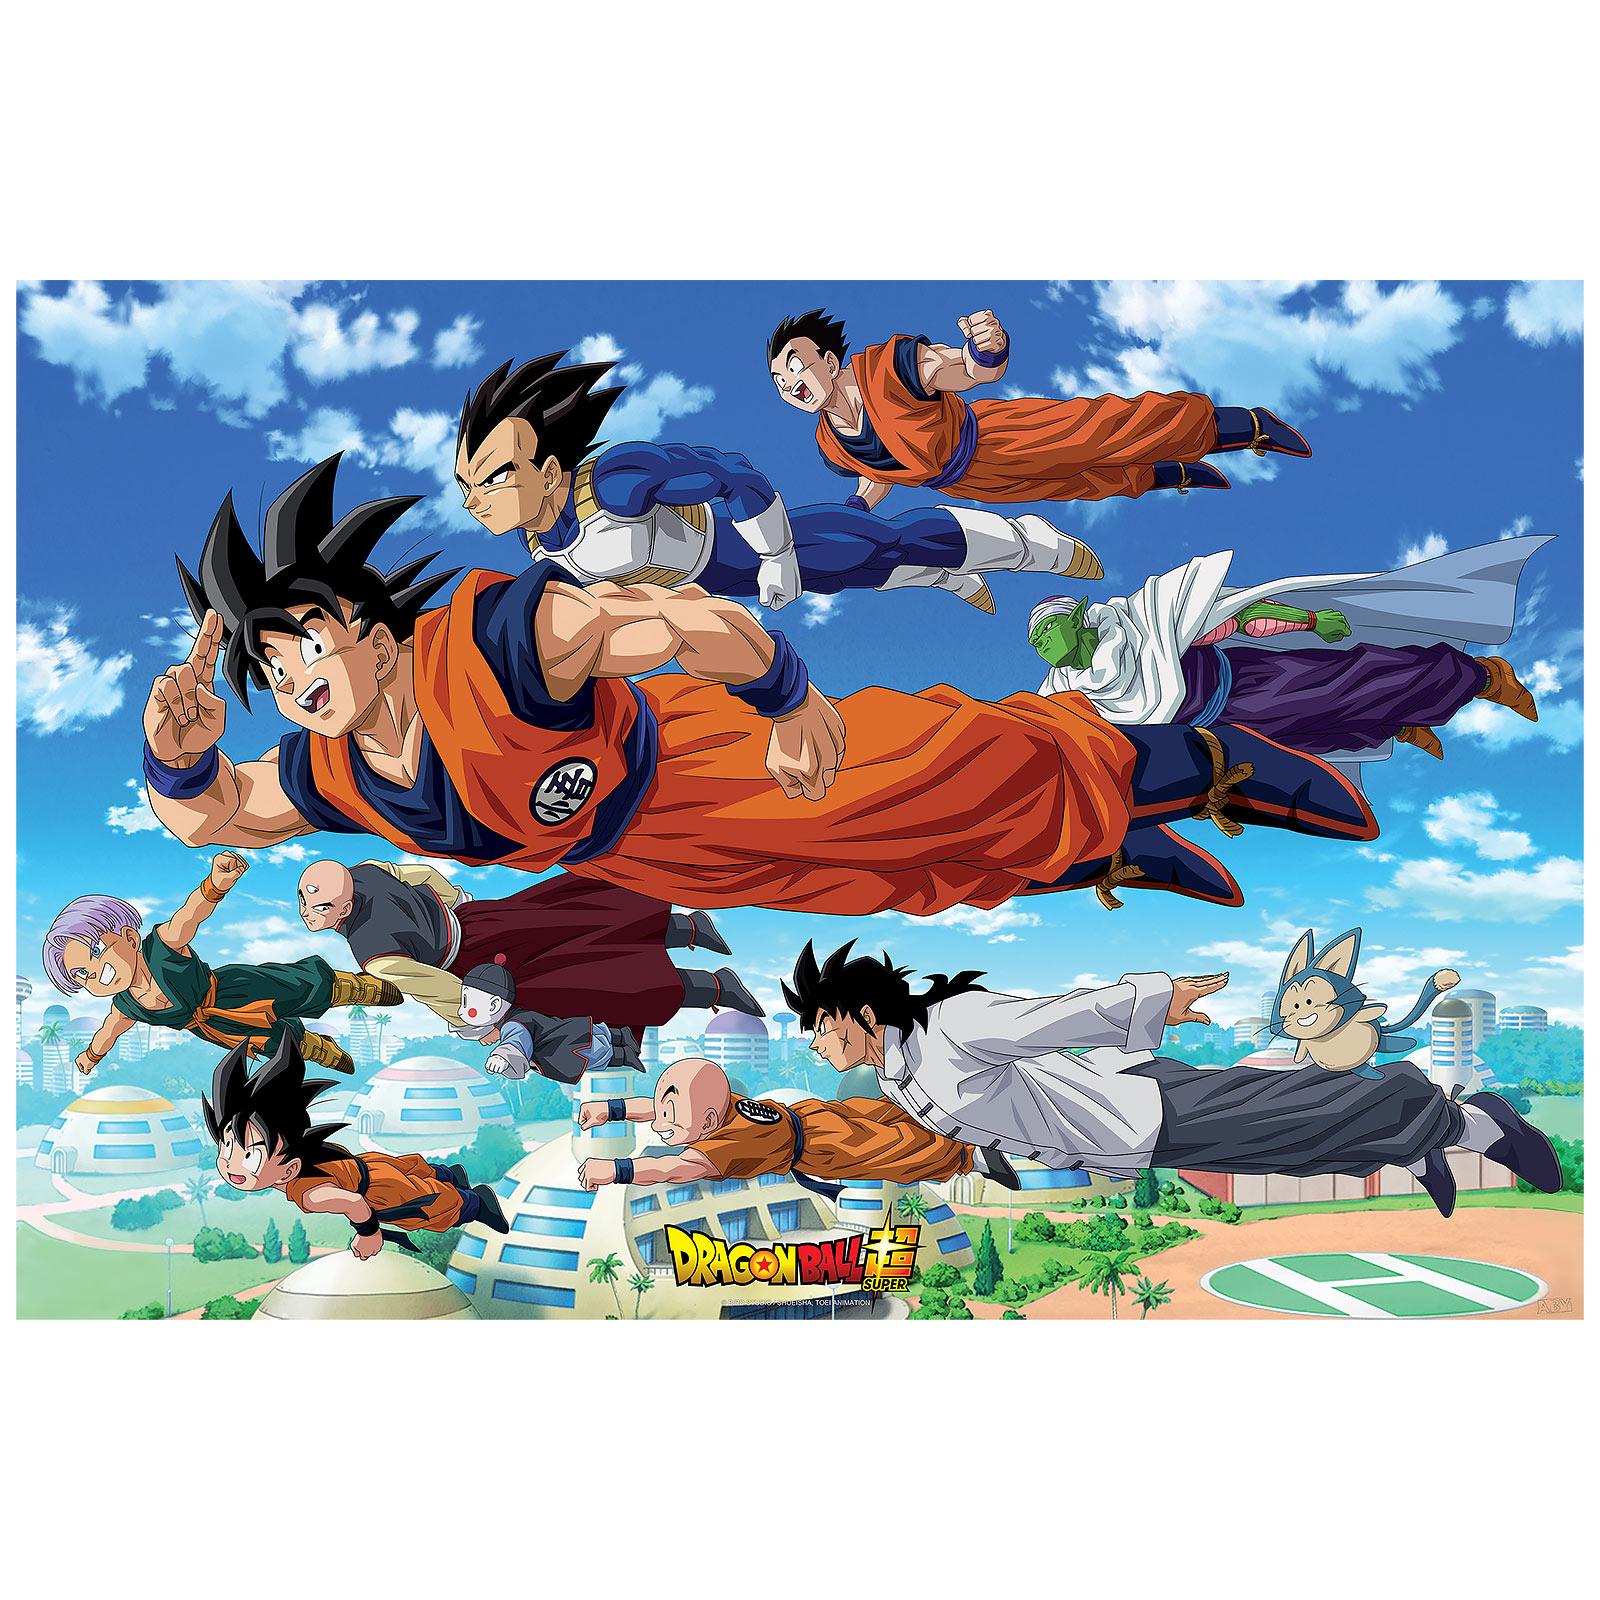 Dragon Ball Super - Goku and Friends Maxi Poster